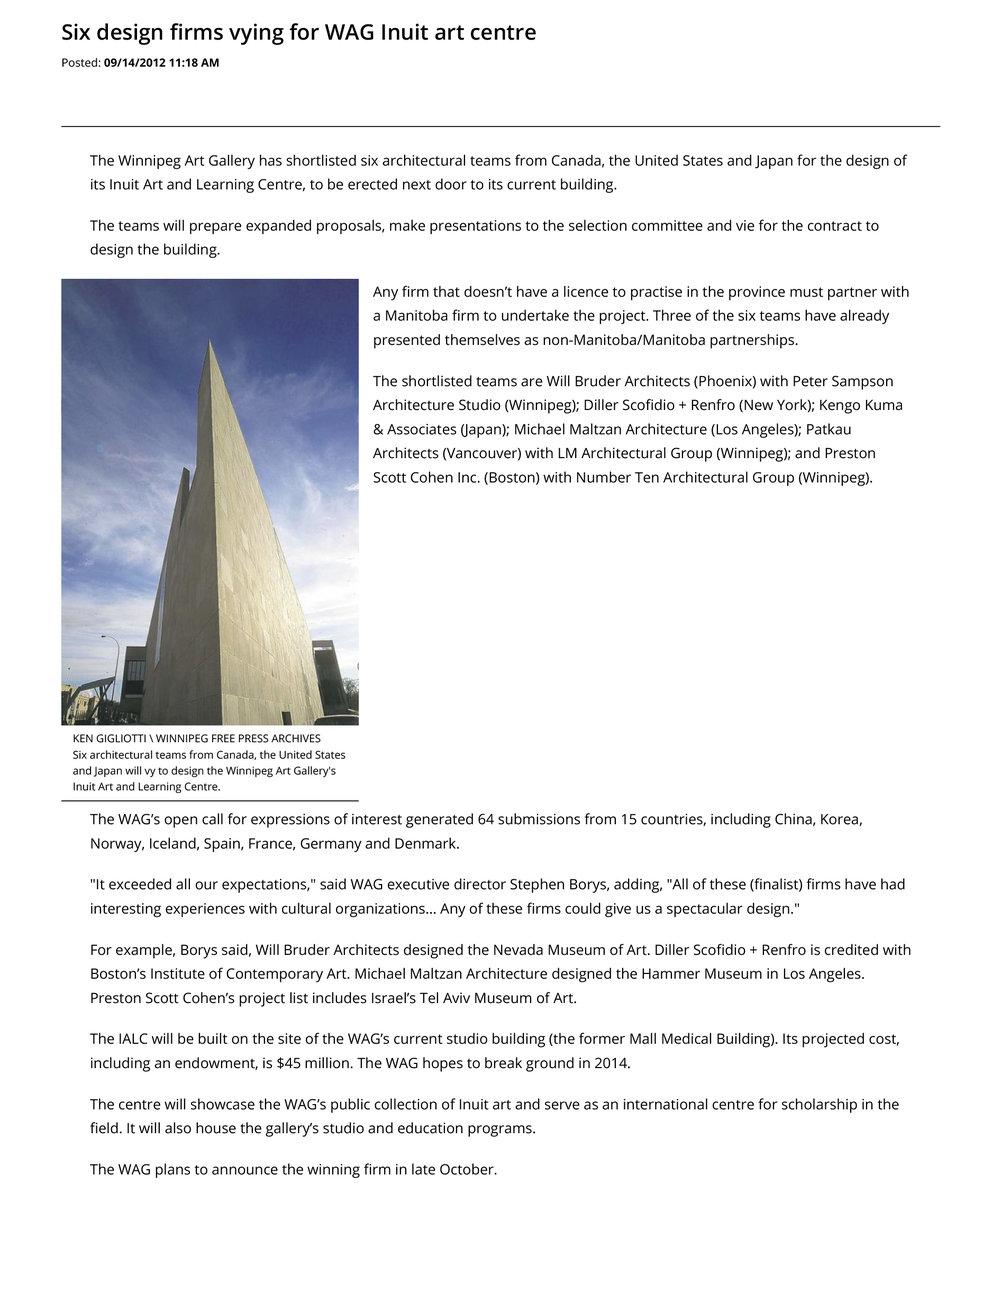 Six design firms vying for WAG Inuit art centre - Winnipeg Free Press-1.jpg